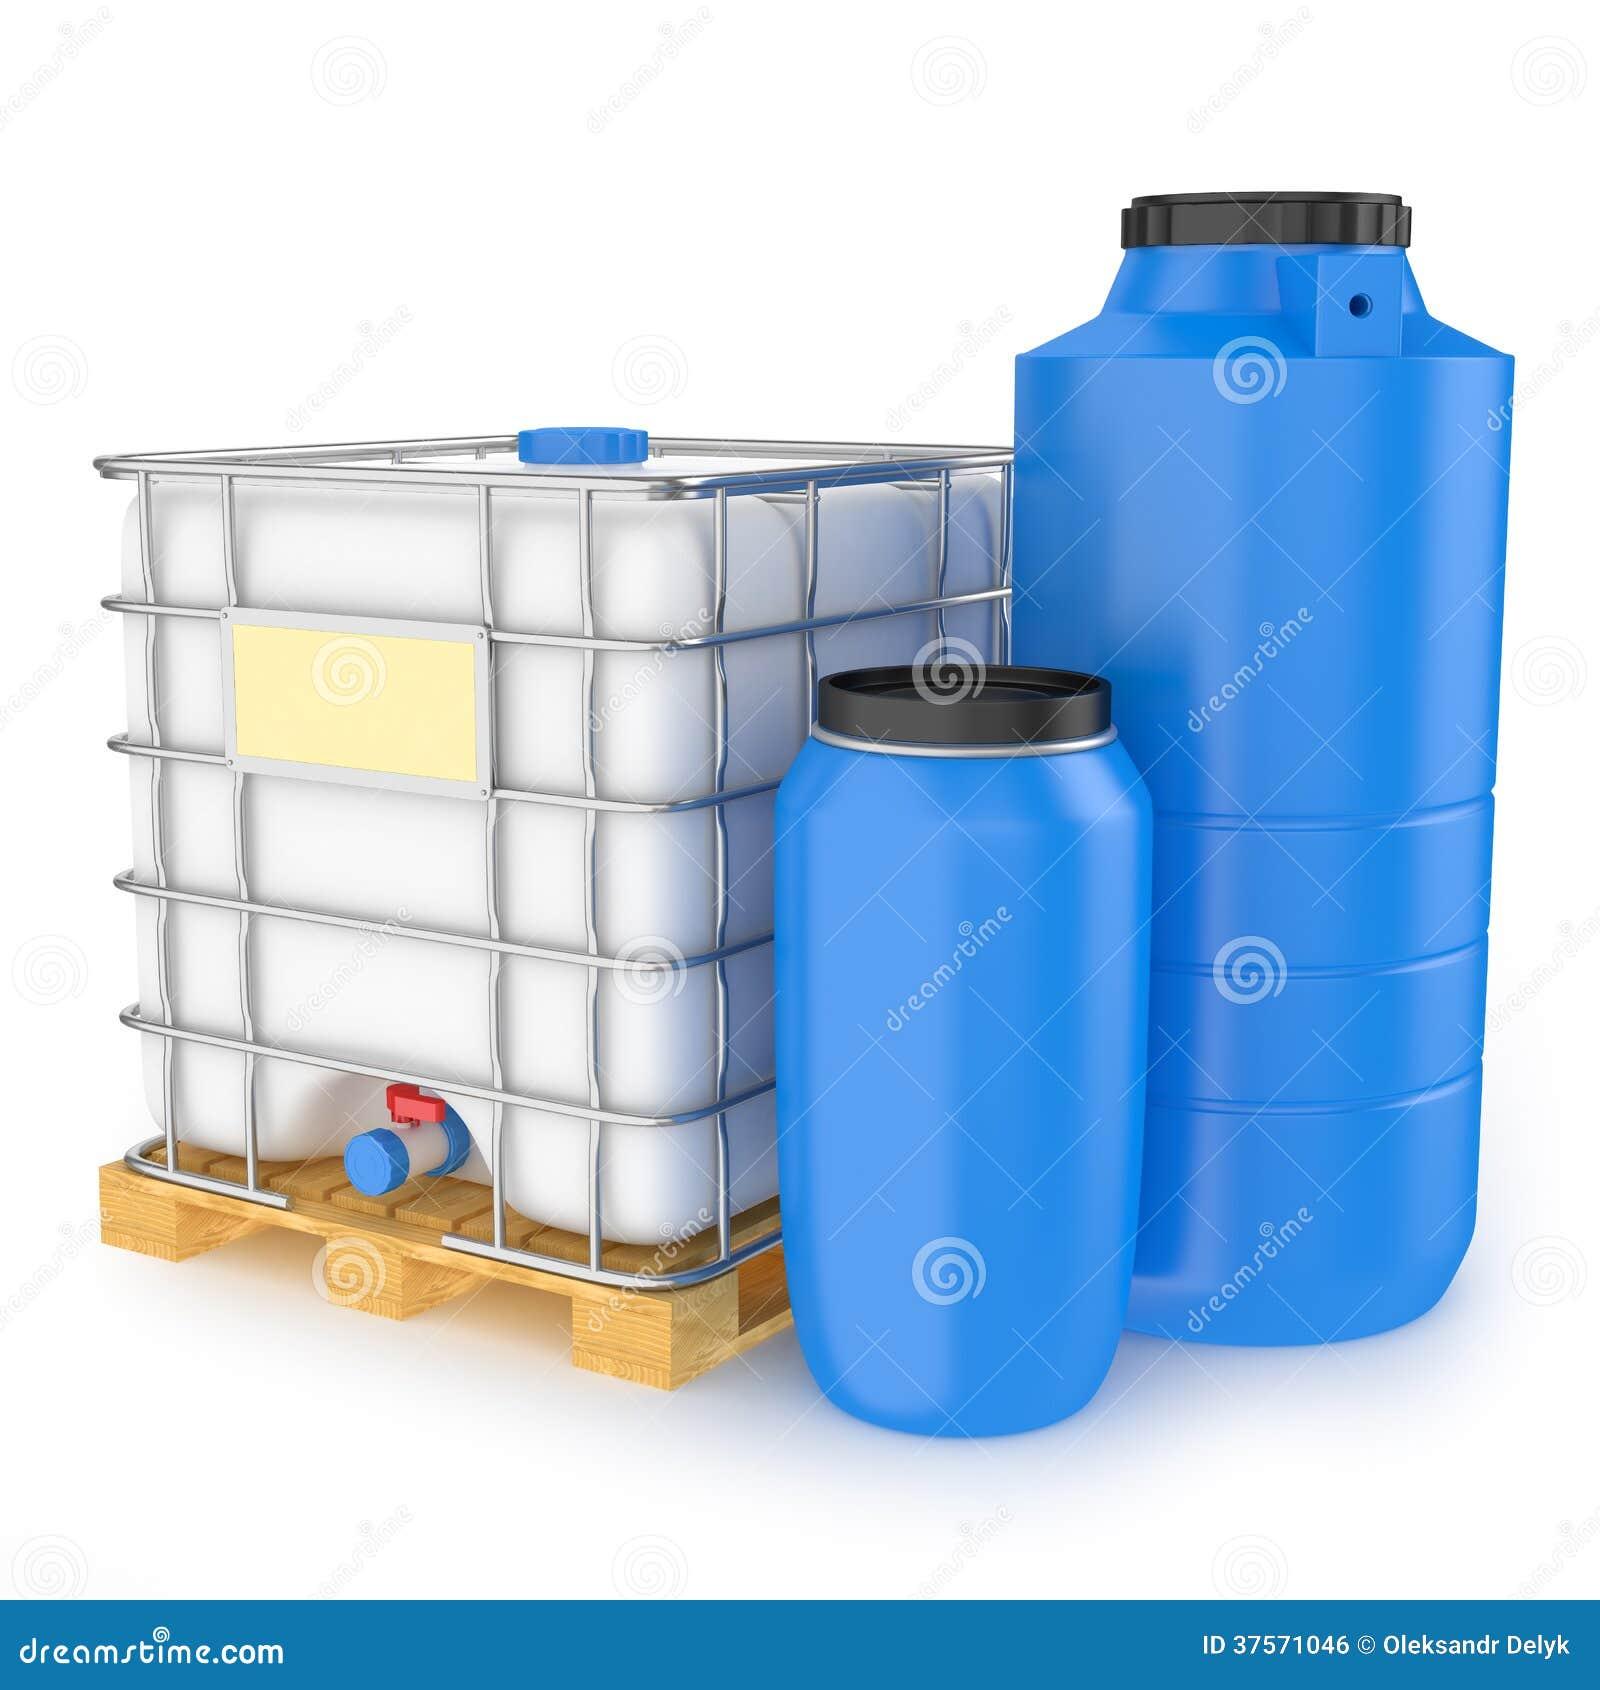 Grupo de los tanques de agua pl sticos en el fondo blanco for Piscicultura en tanques plasticos